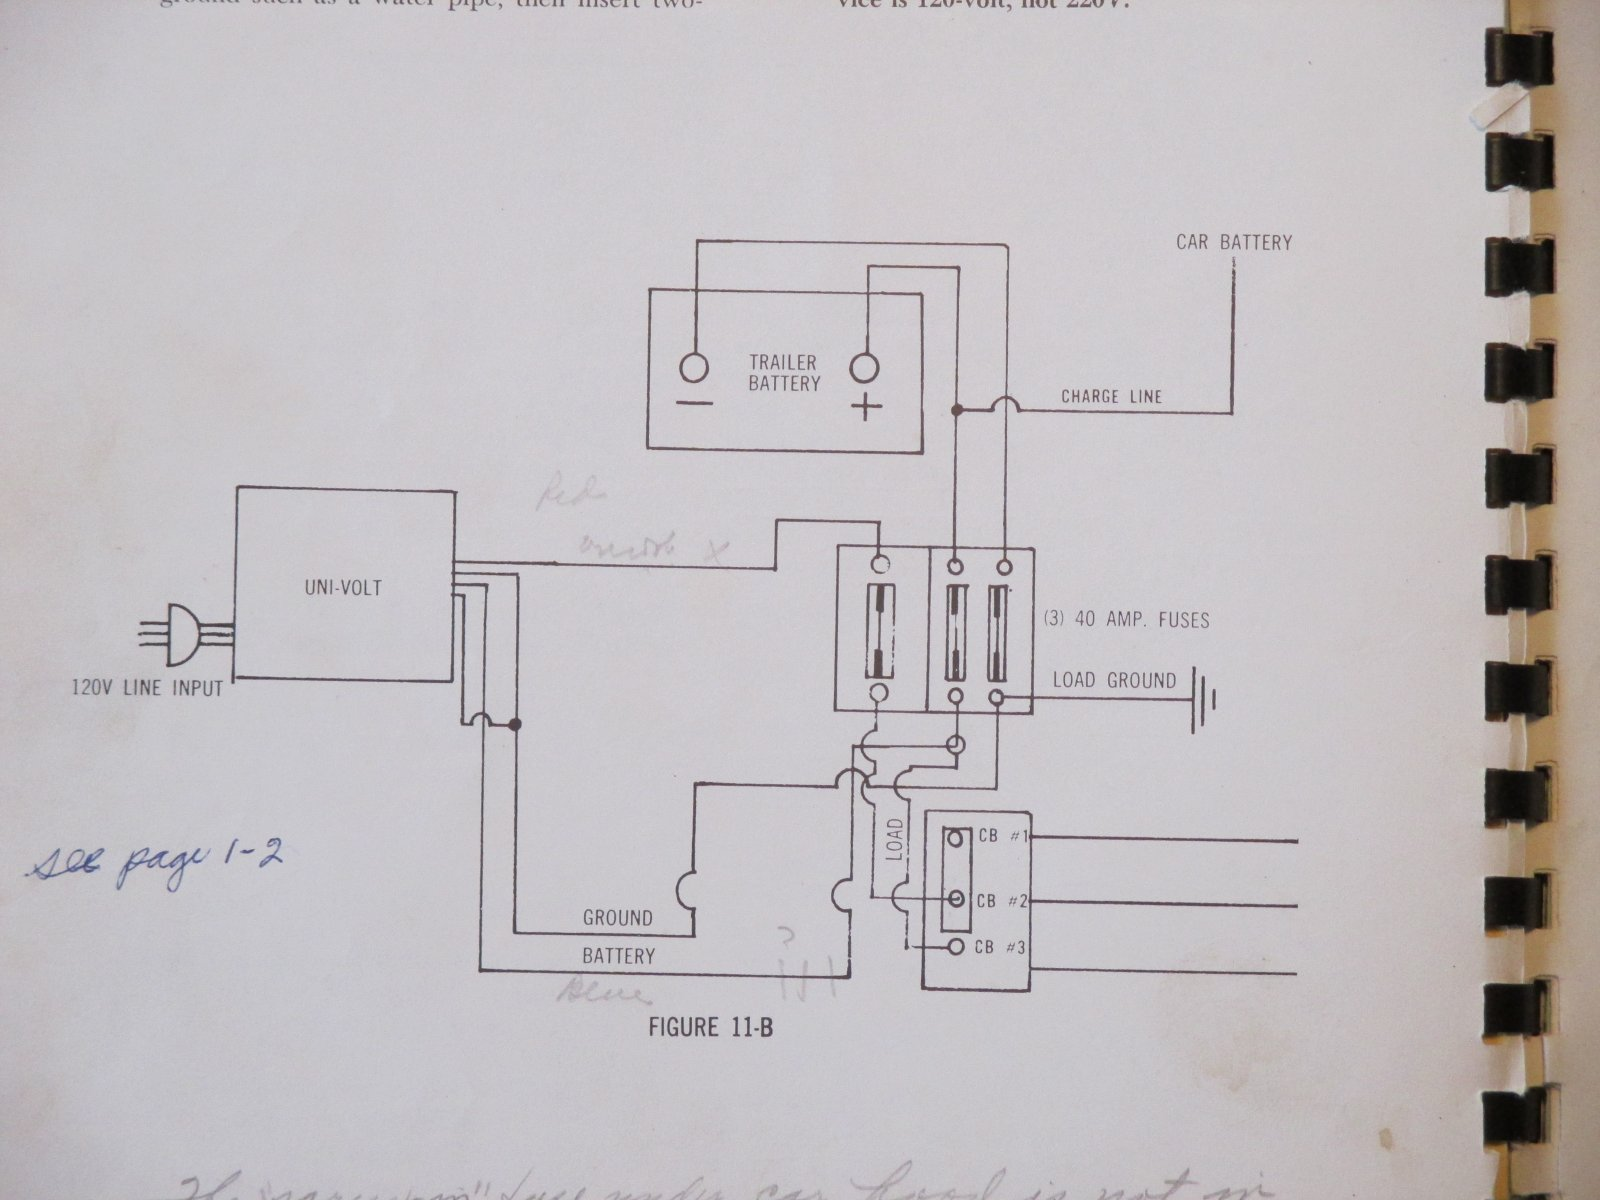 Click image for larger version  Name:1404 Univolt Wiring Diagram.jpg Views:246 Size:180.7 KB ID:249806